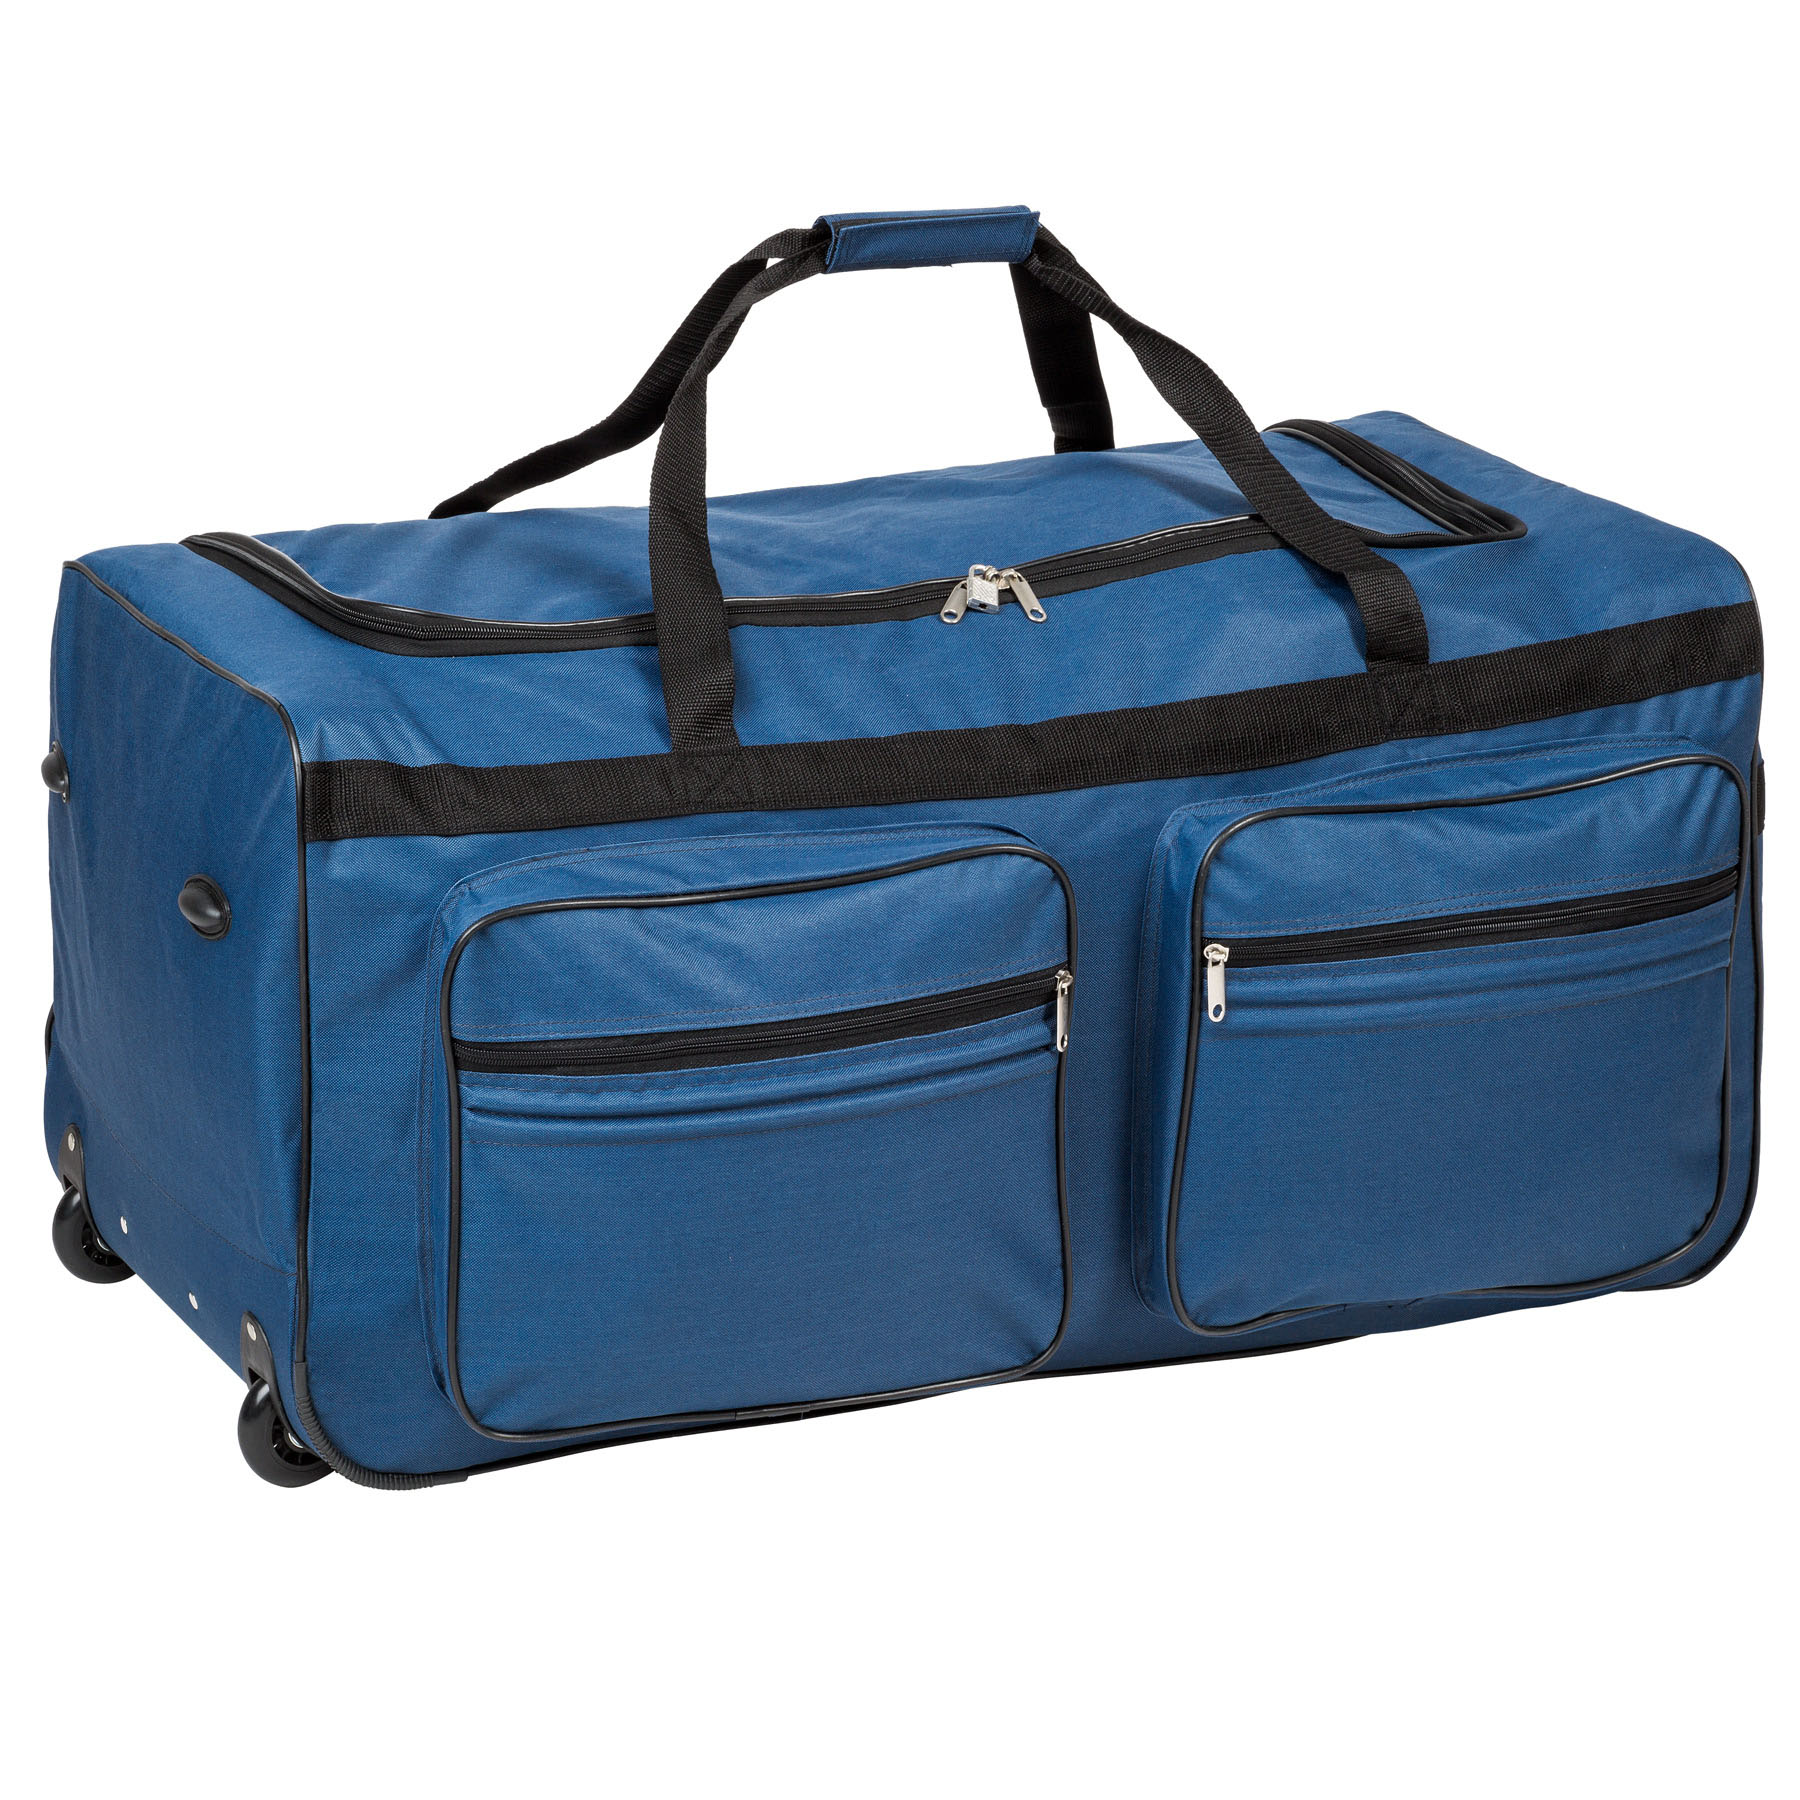 Torba podróżna walizka na kółkach 160 l 402215